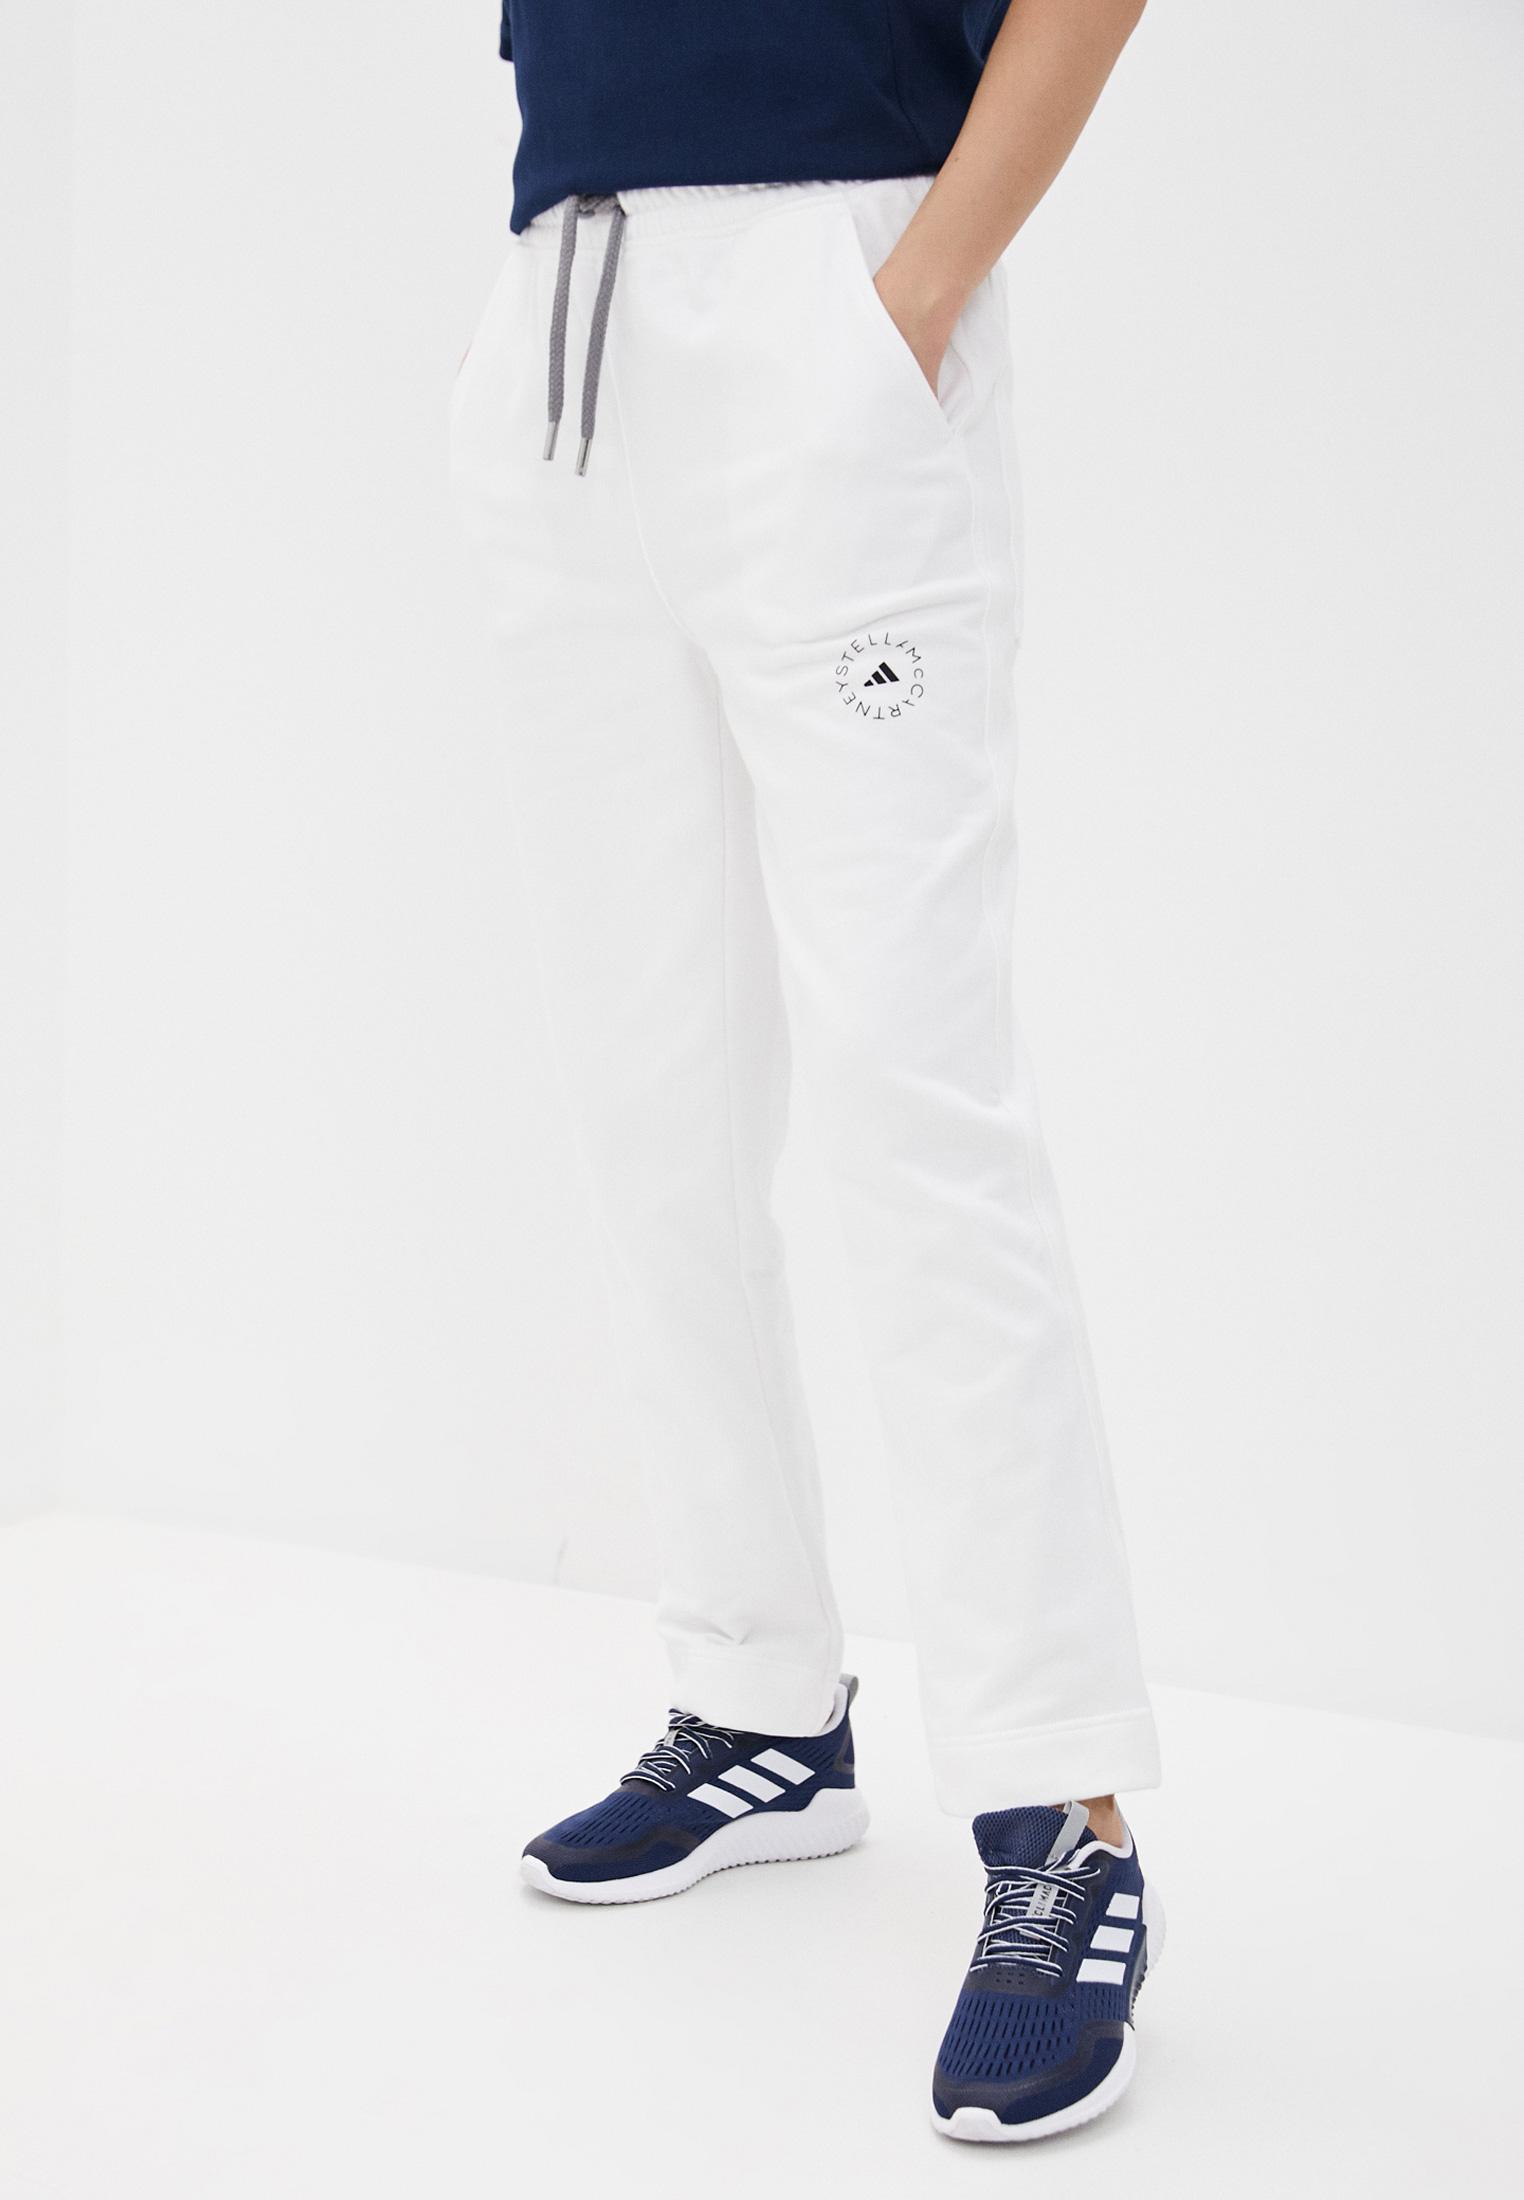 Женские брюки adidas by Stella McCartney Брюки спортивные adidas by Stella McCartney